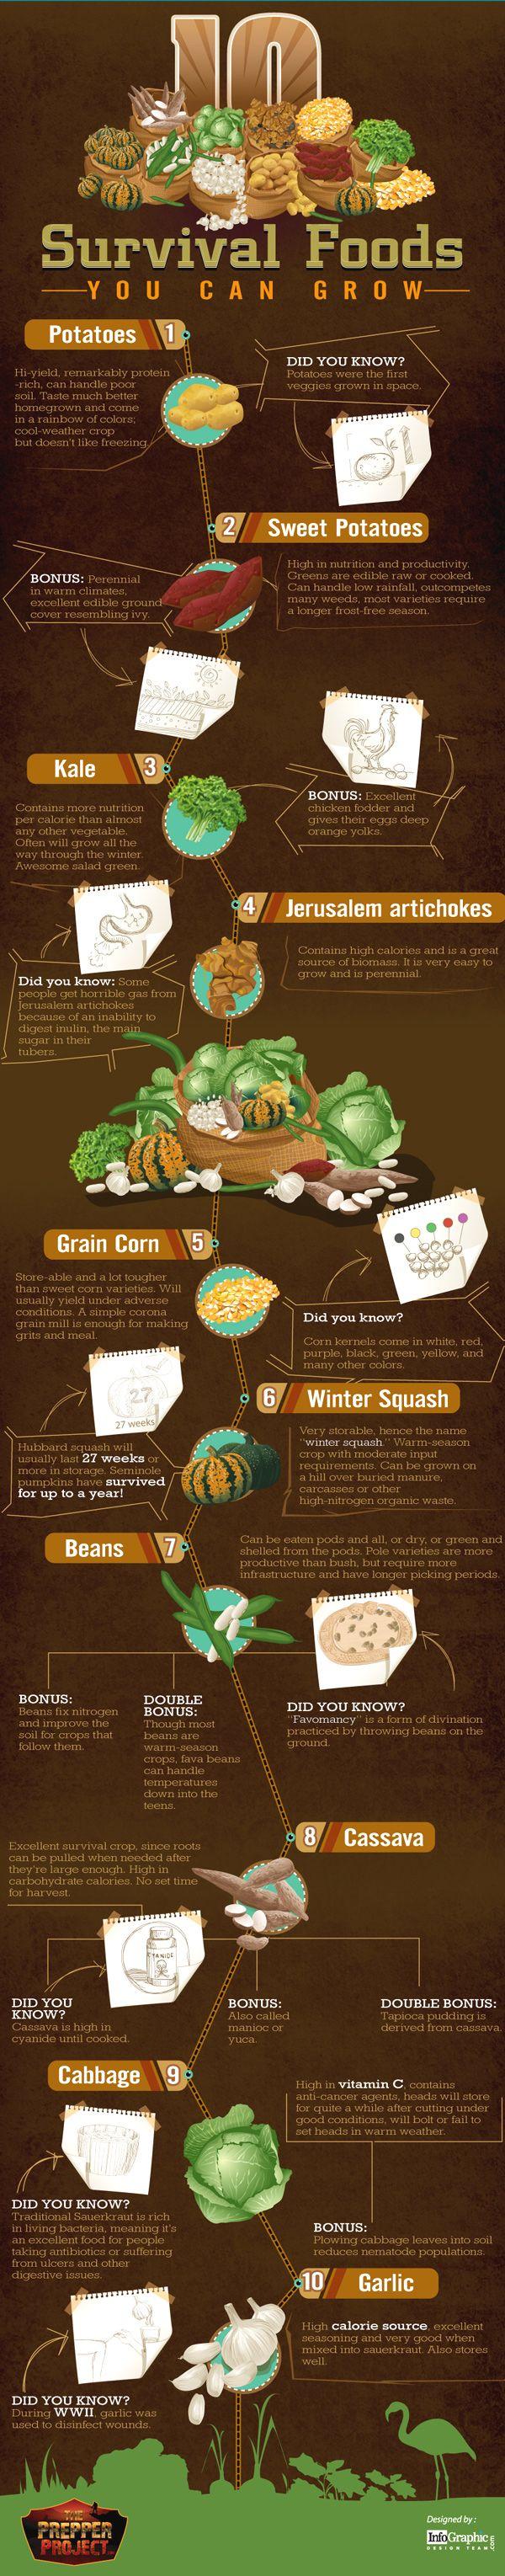 10 Survival Foods